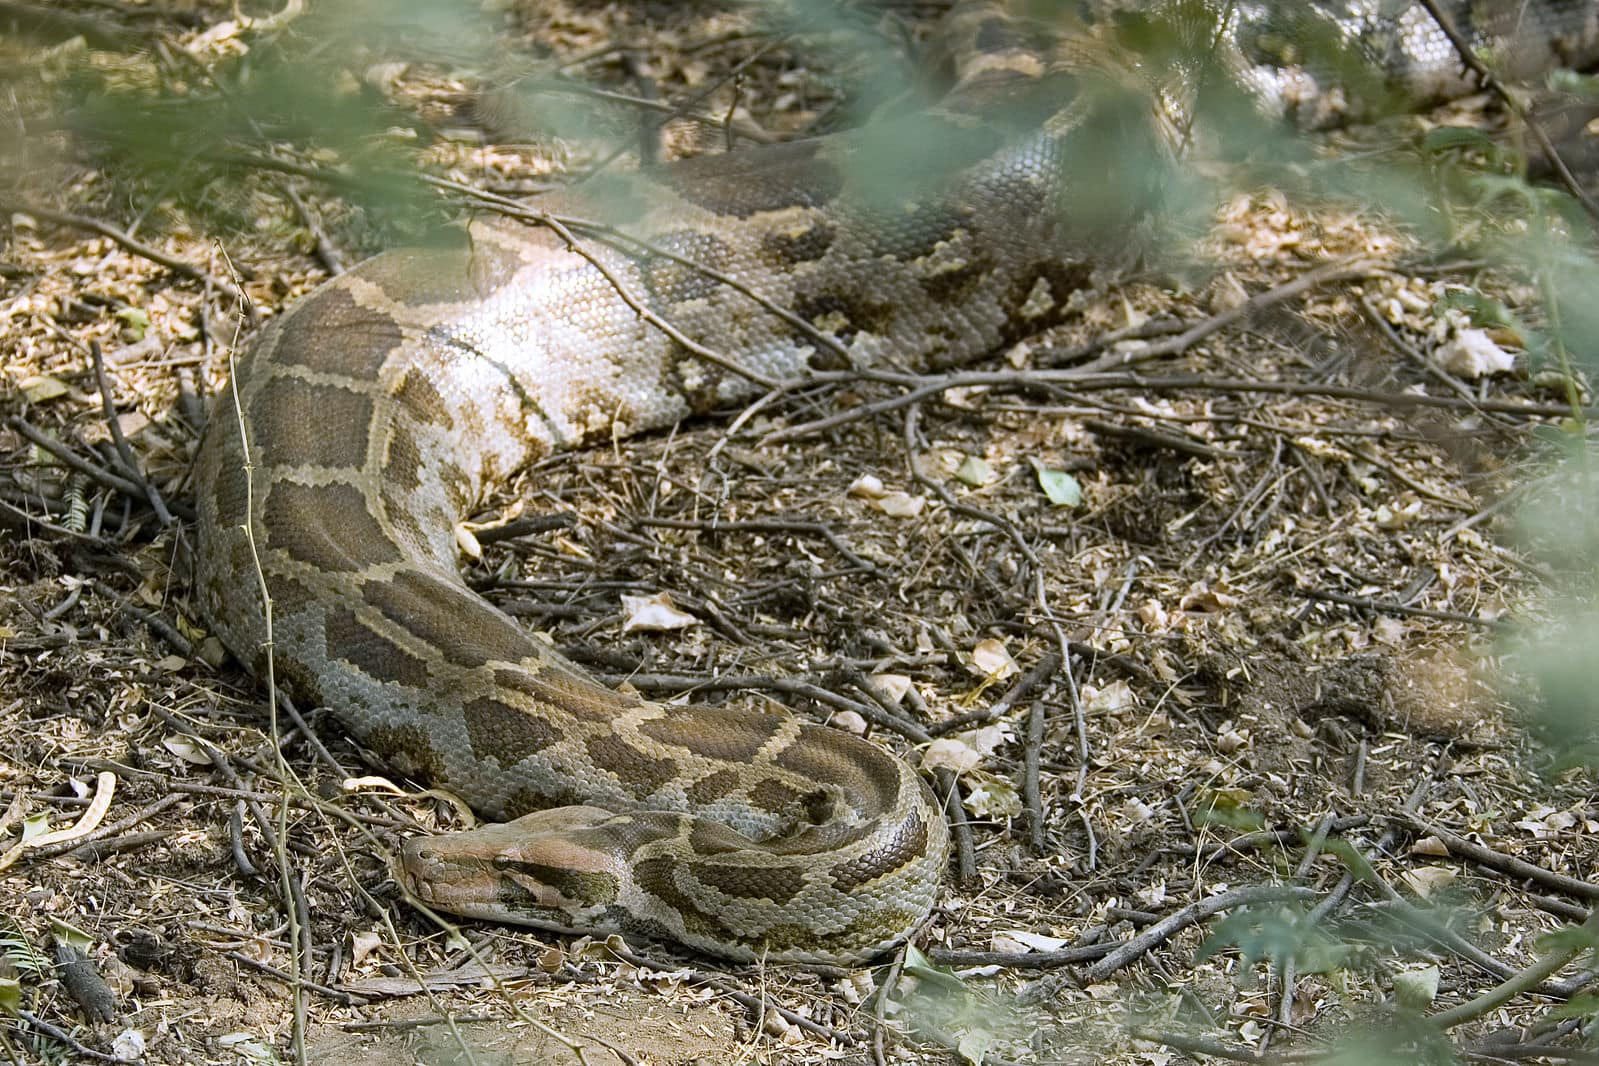 Indian python Python